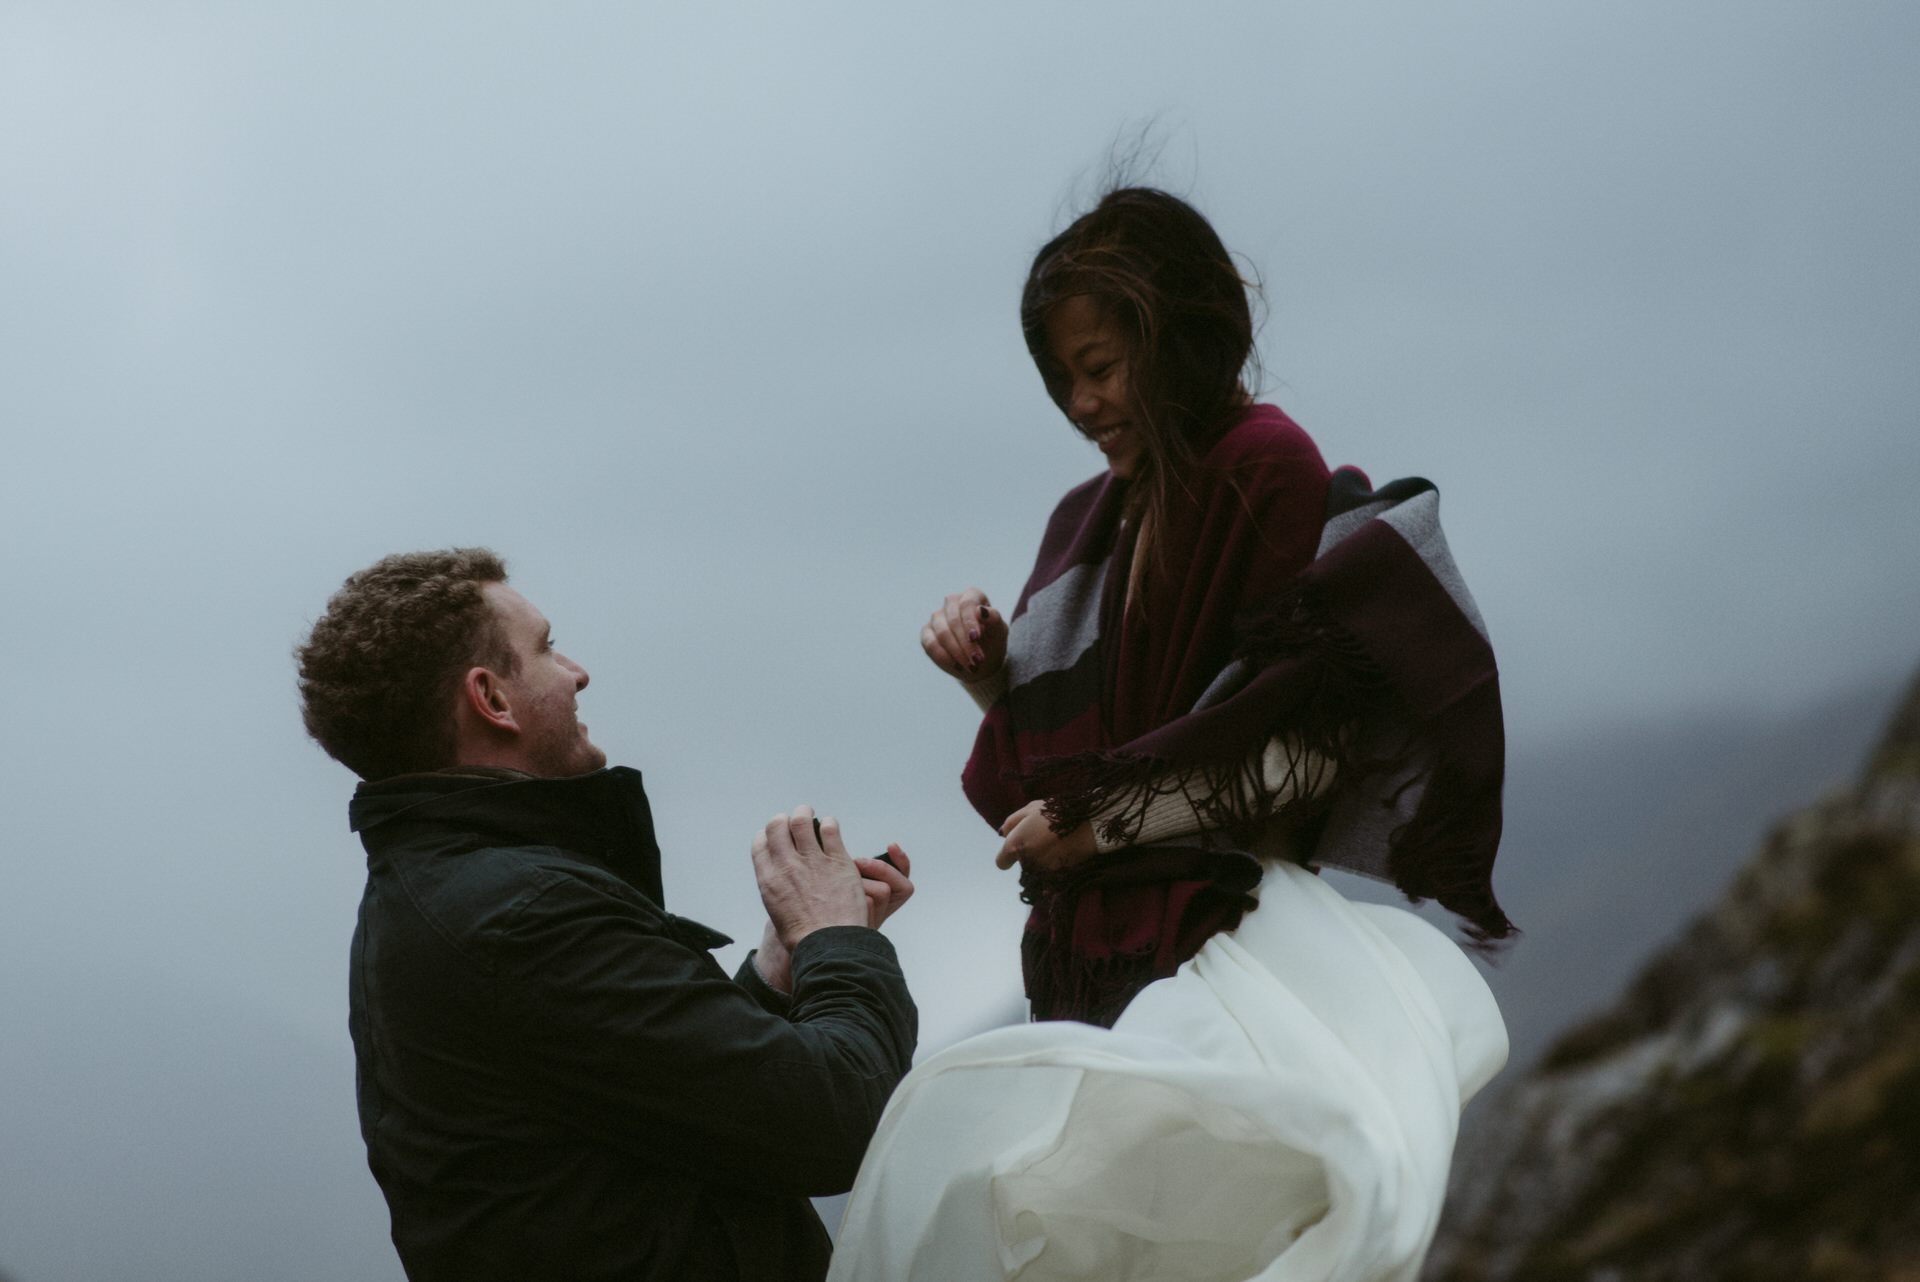 Surprise-Marriage-Proposal-Glencoe_52